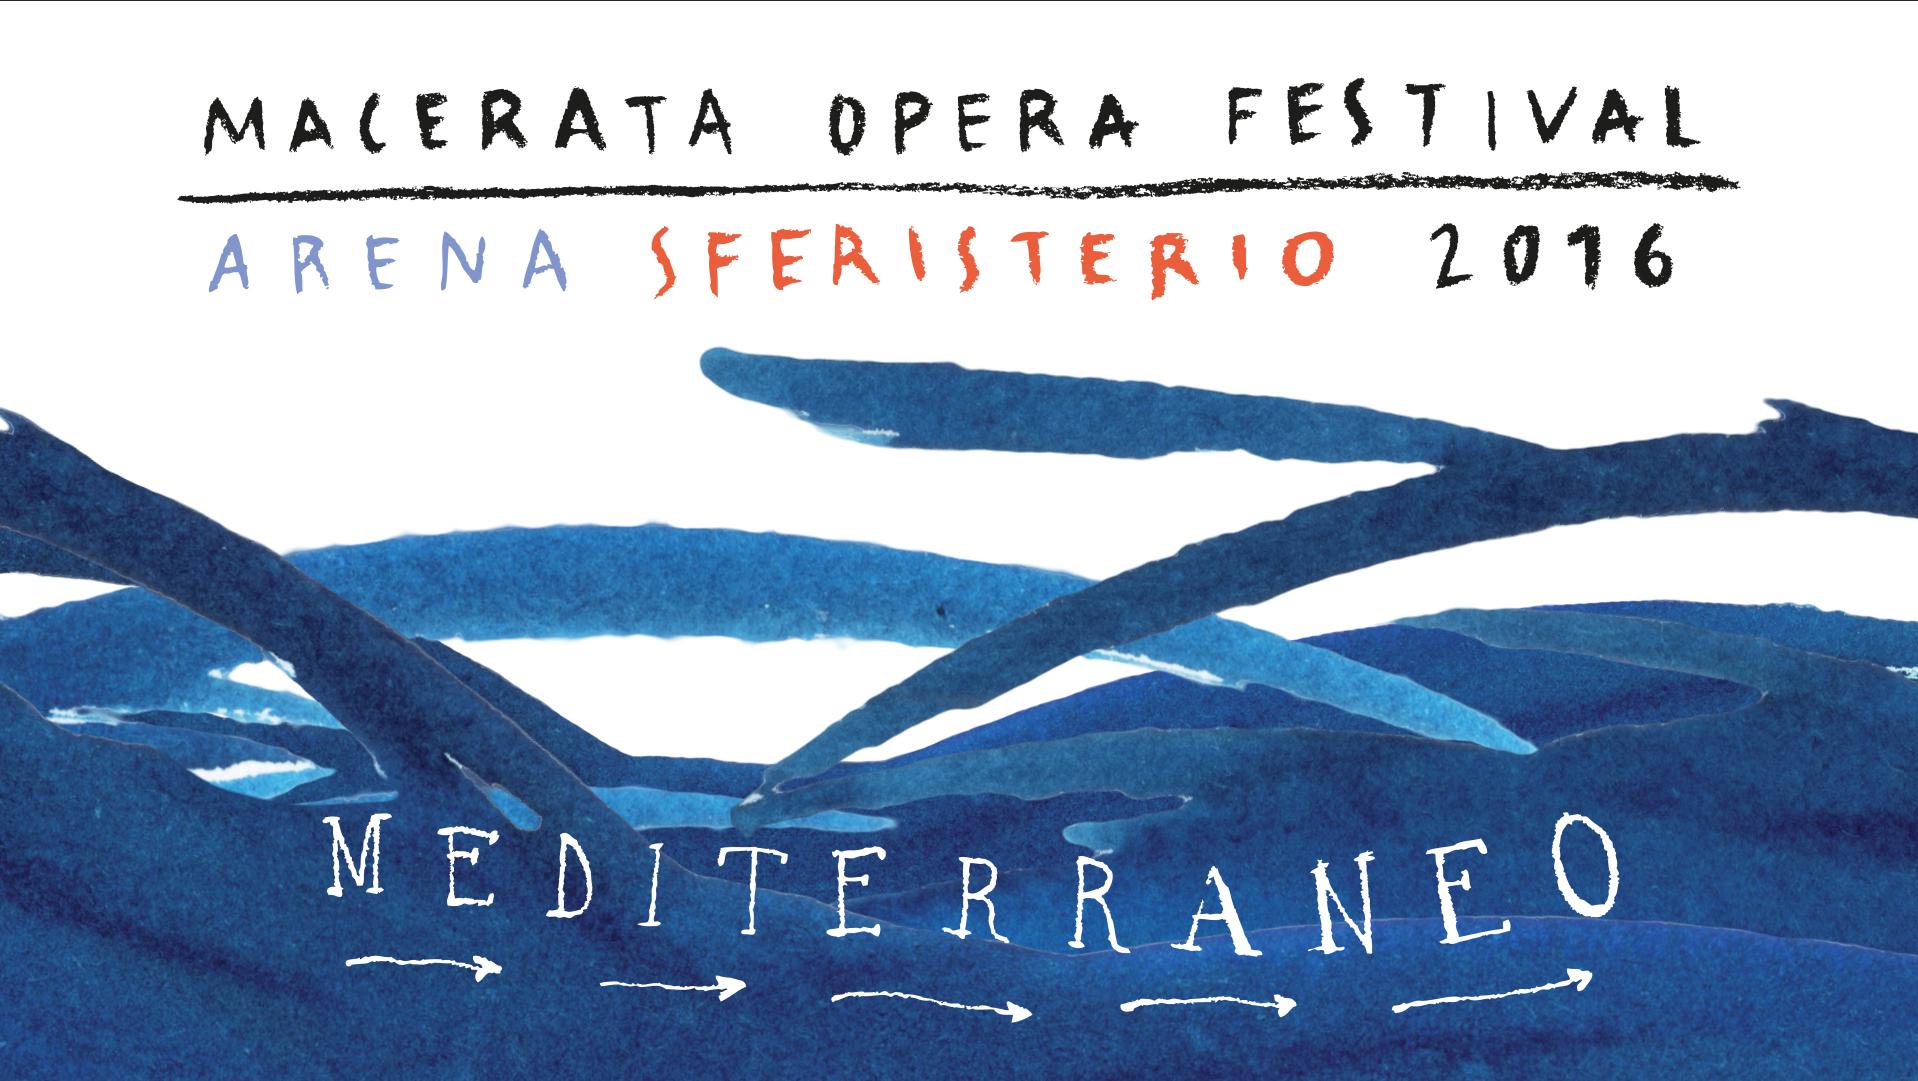 Macerata opera festival, alia simoncini videomaker